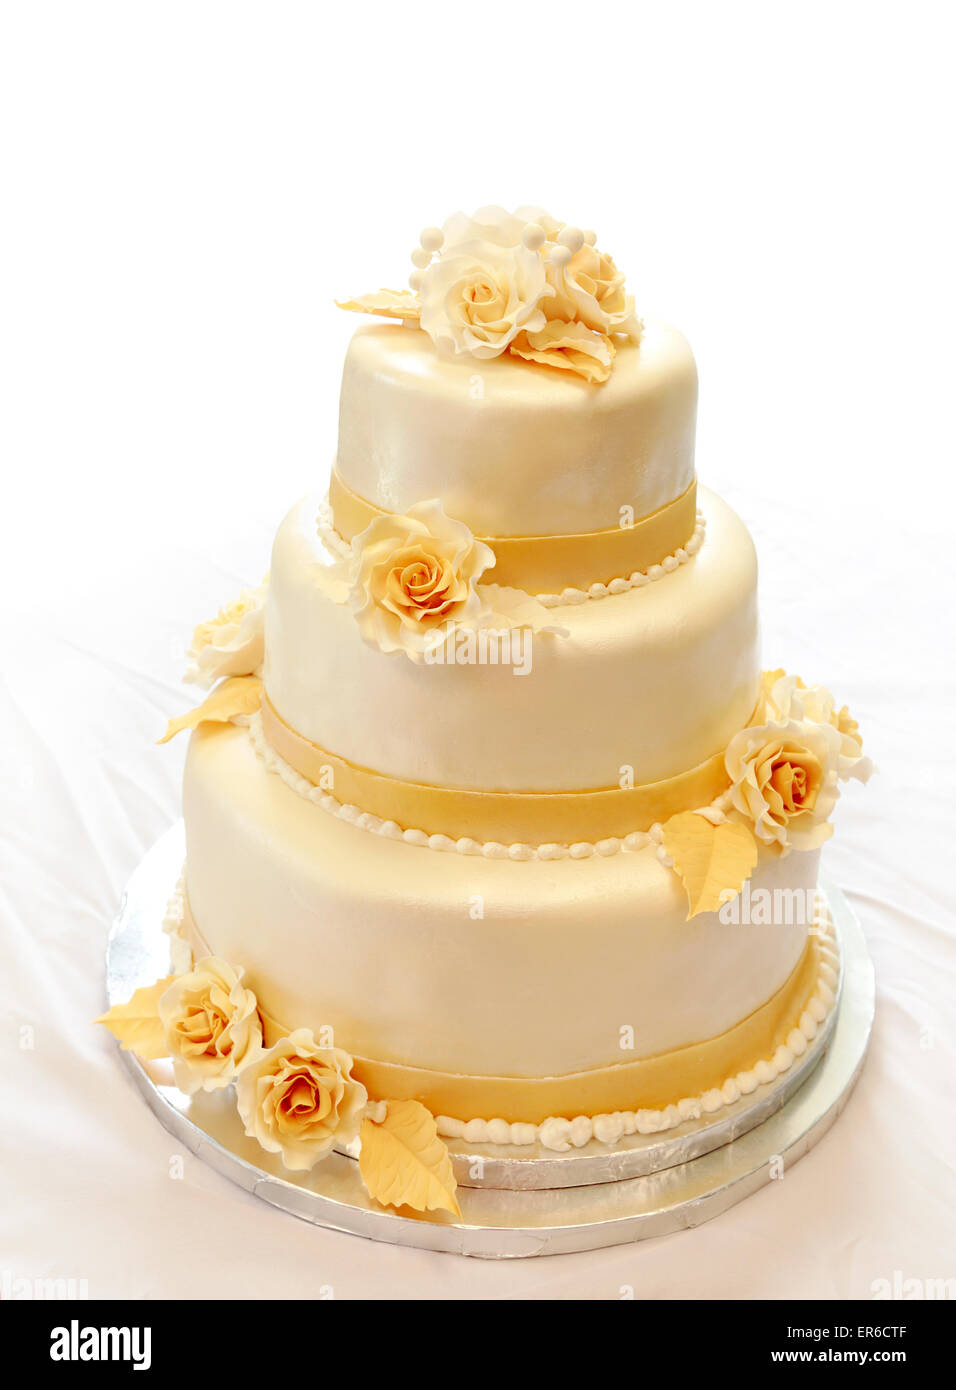 Fondant Wedding Cake Stock Photos & Fondant Wedding Cake Stock ...